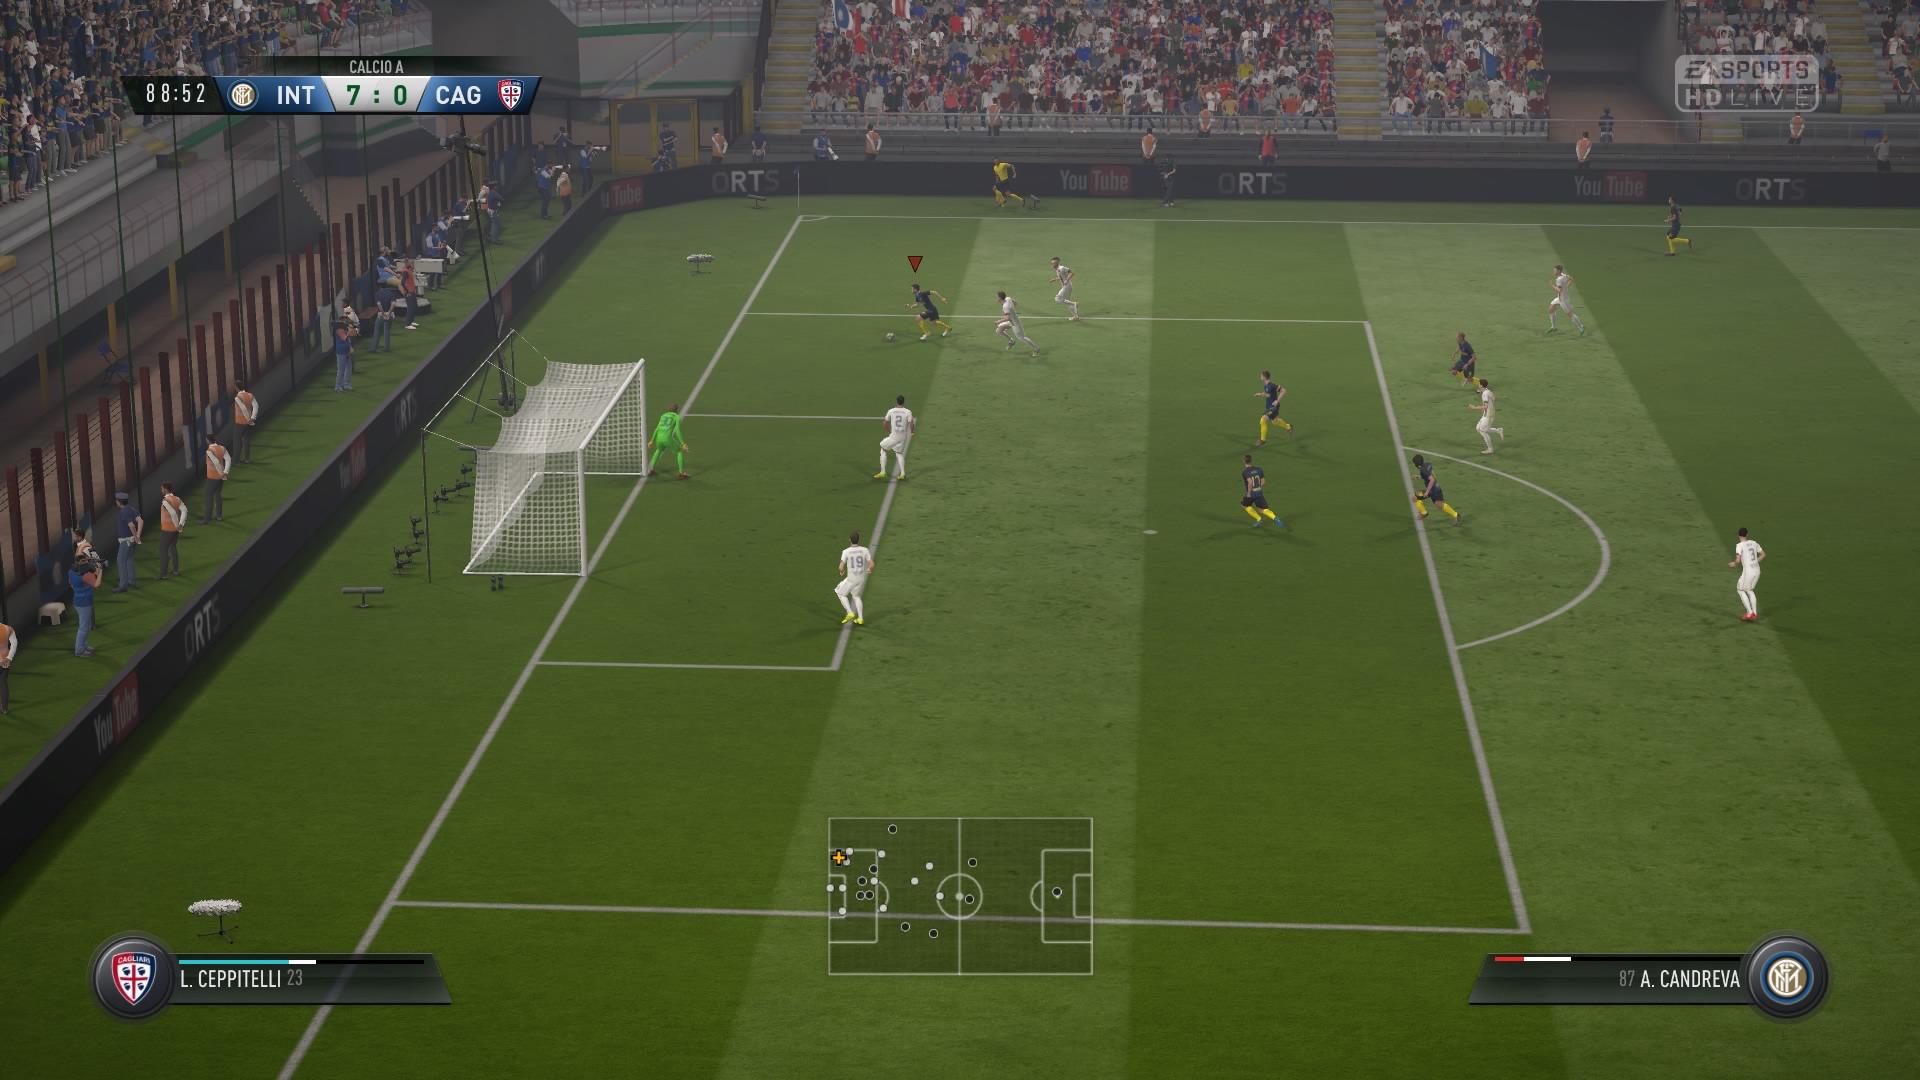 FIFA 17 Szybki mecz 7:0 INT — CAG, 2. poł.